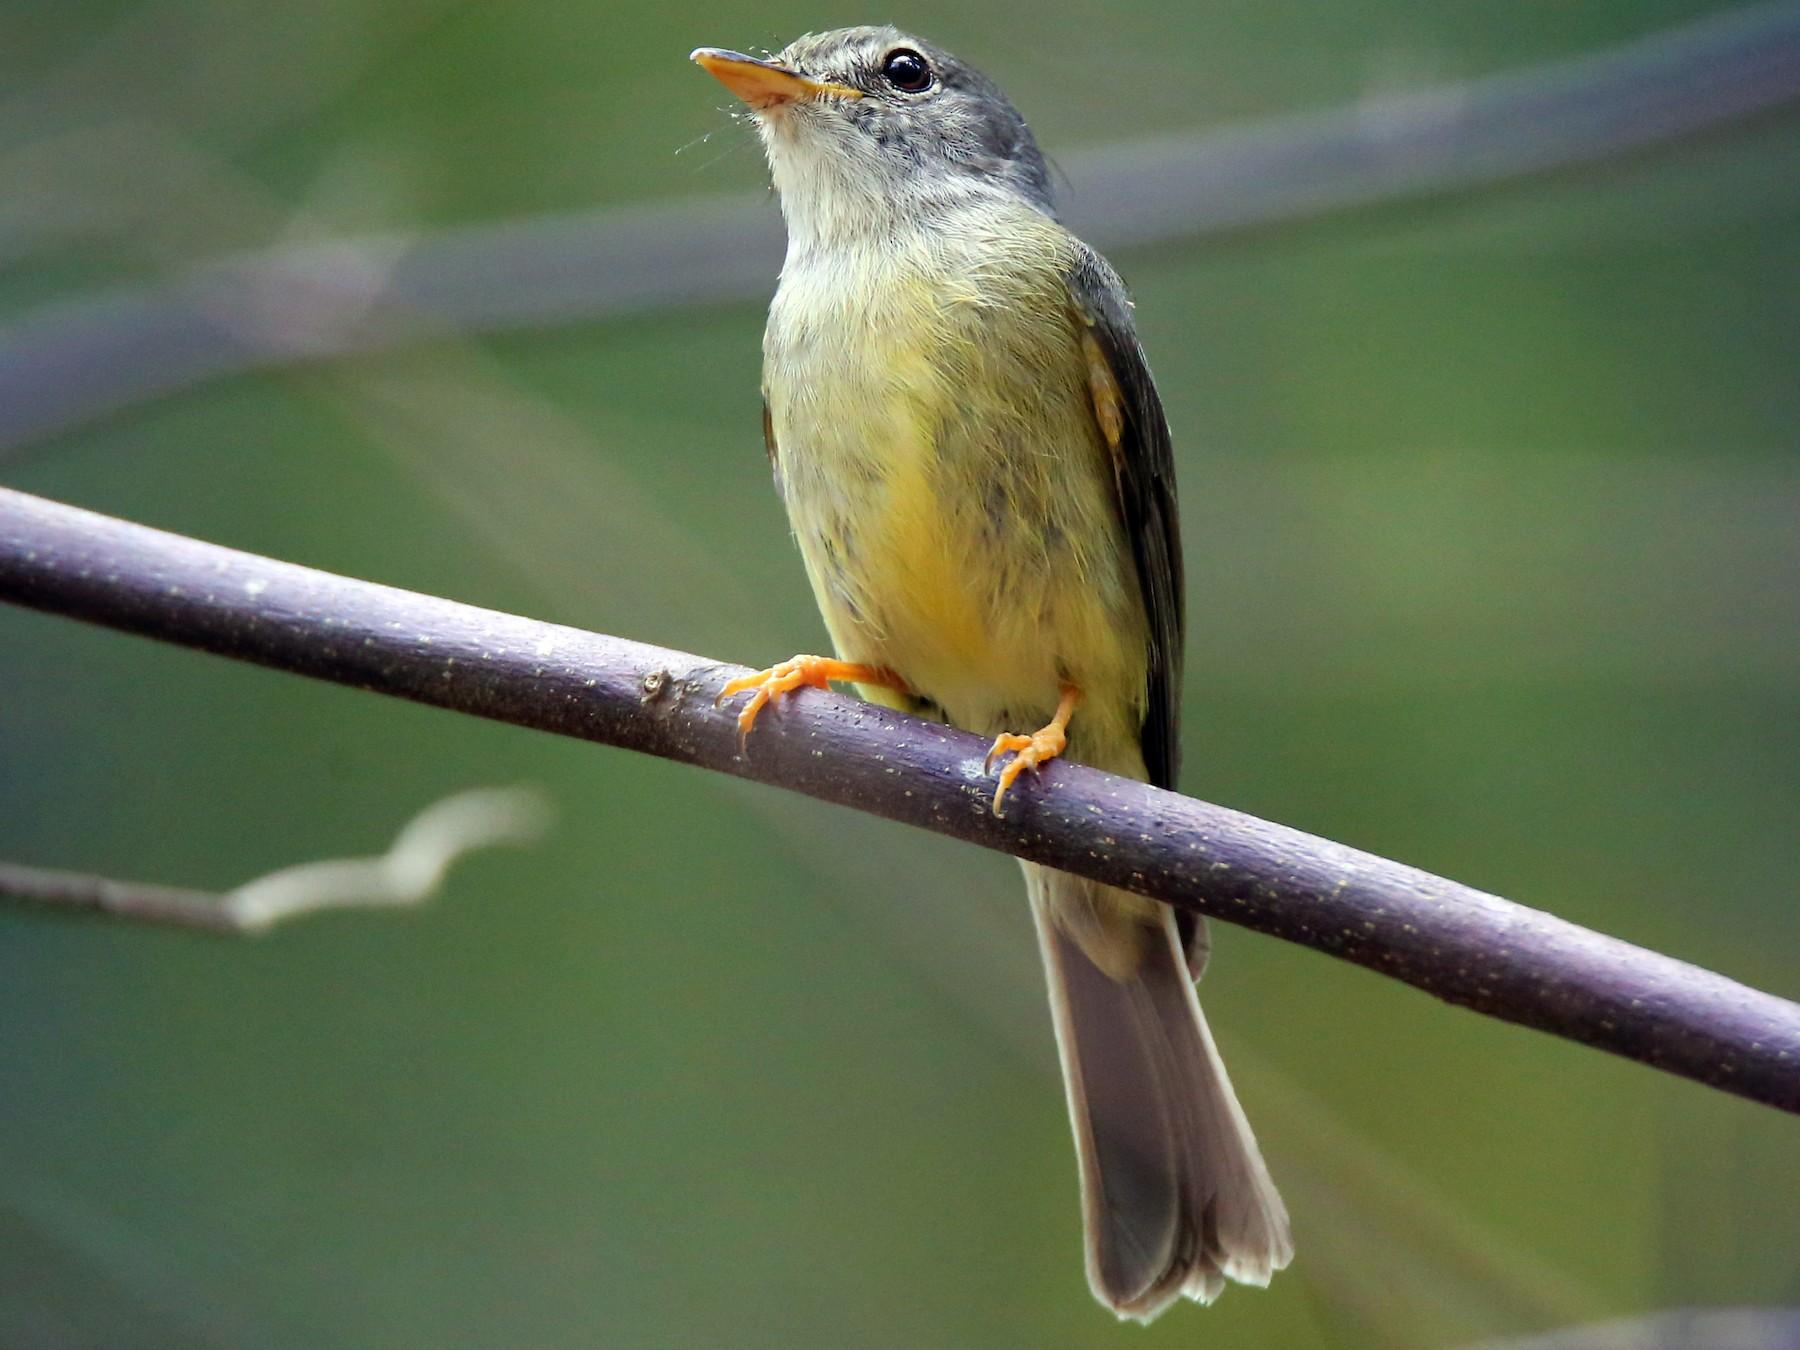 Yellow-legged Flycatcher - Doug Herrington || Birdwatching Tropical Australia Tours